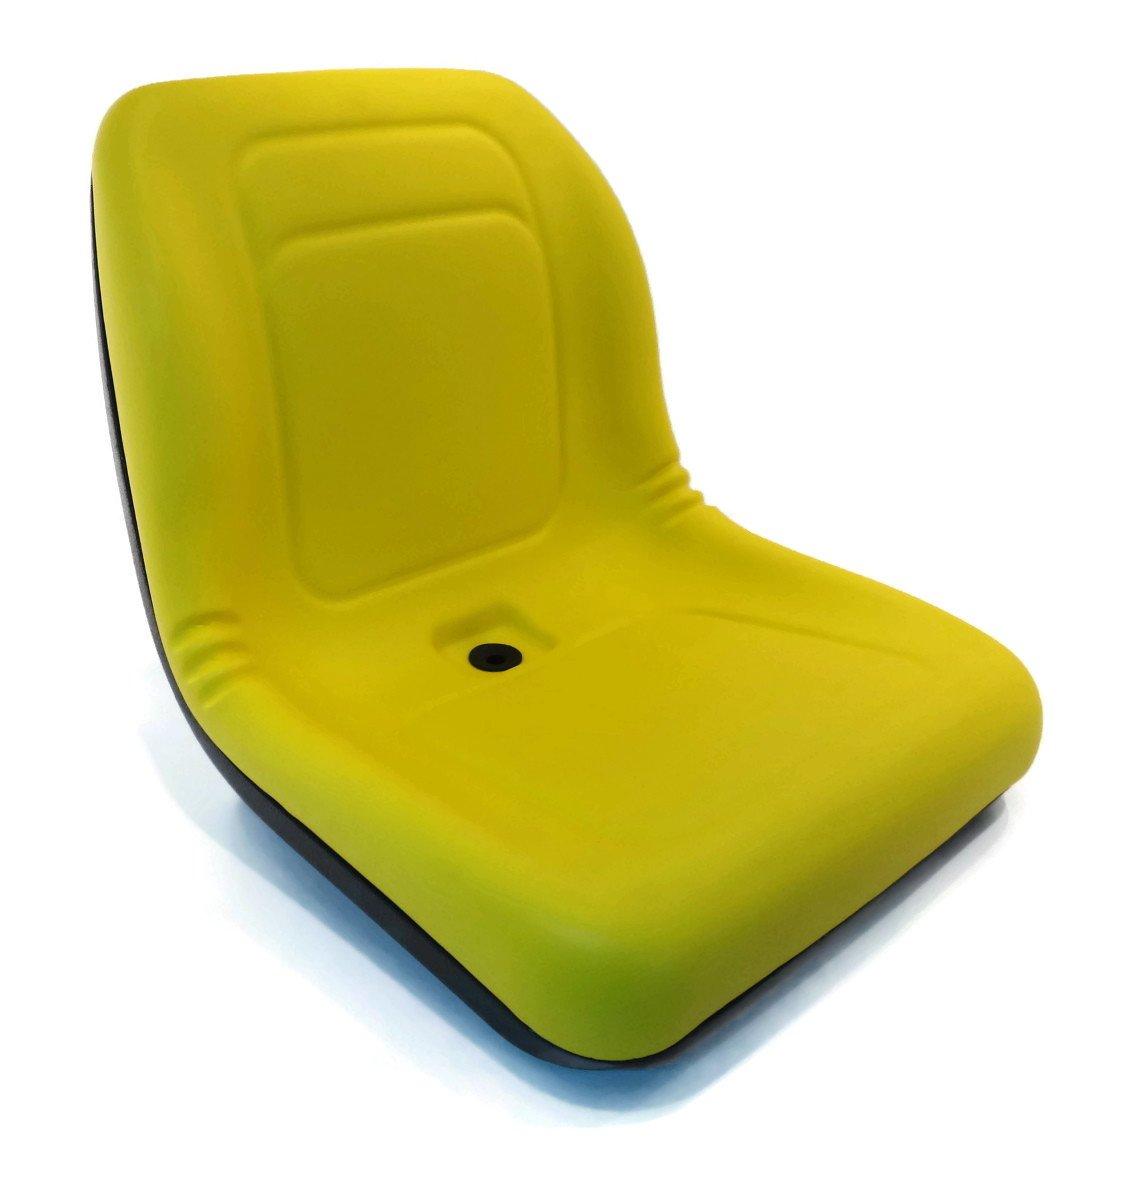 New Camo HIGH BACK SEAT for John Deere Z-Track ZTR F620 F680 Lawn Mower